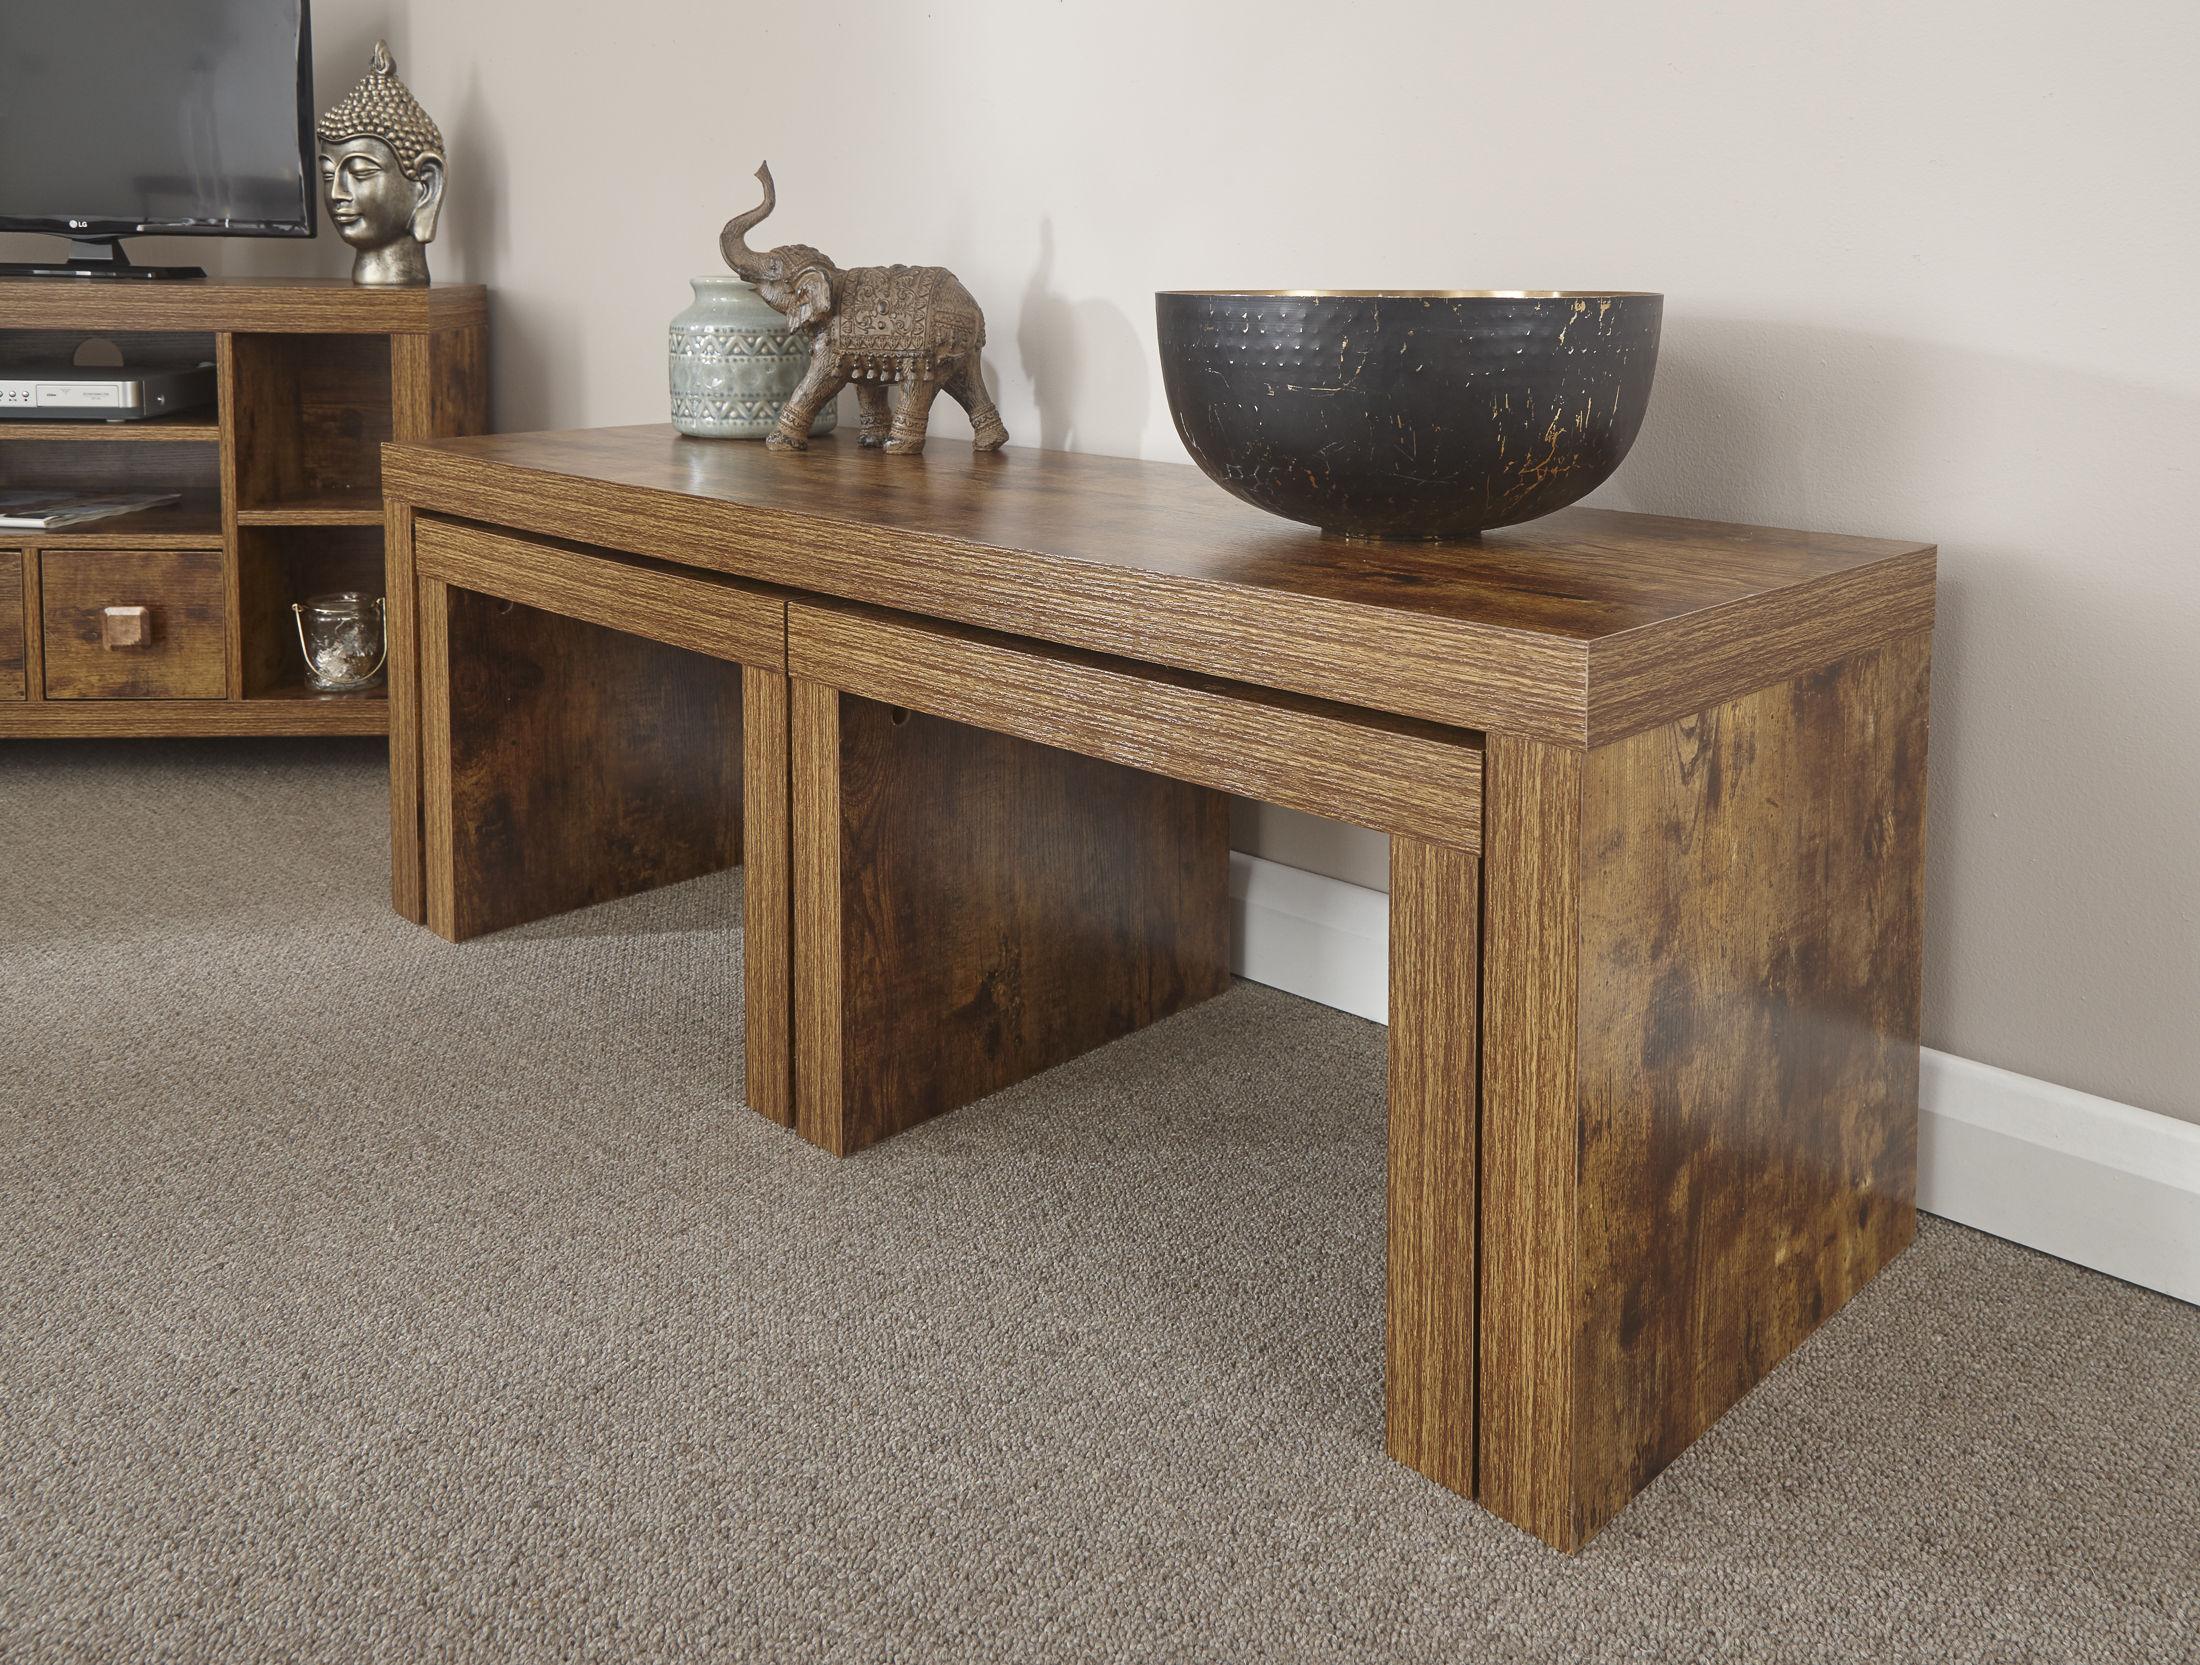 Jakarta Mango Wood Living Room Furniture Nest Tables UK Free